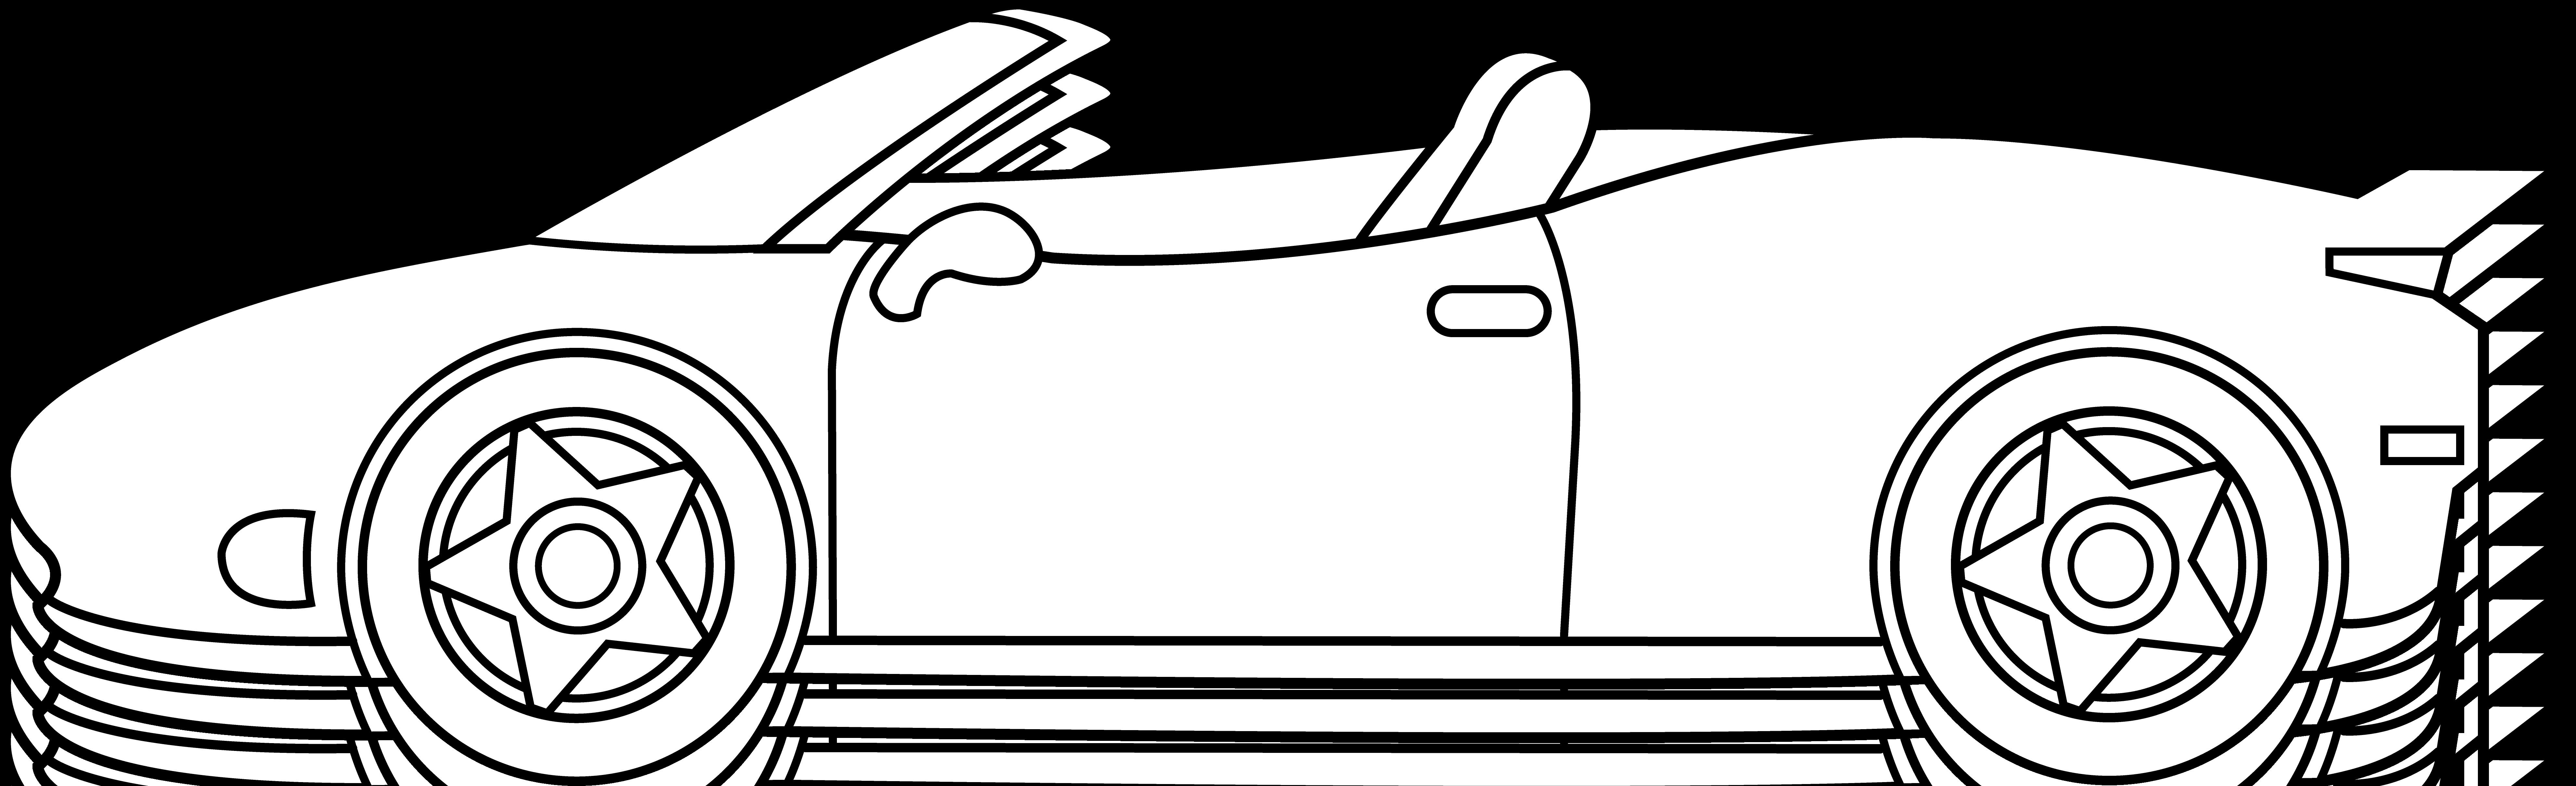 picture freeuse Cartoon clip art eskay. Race car black and white clipart